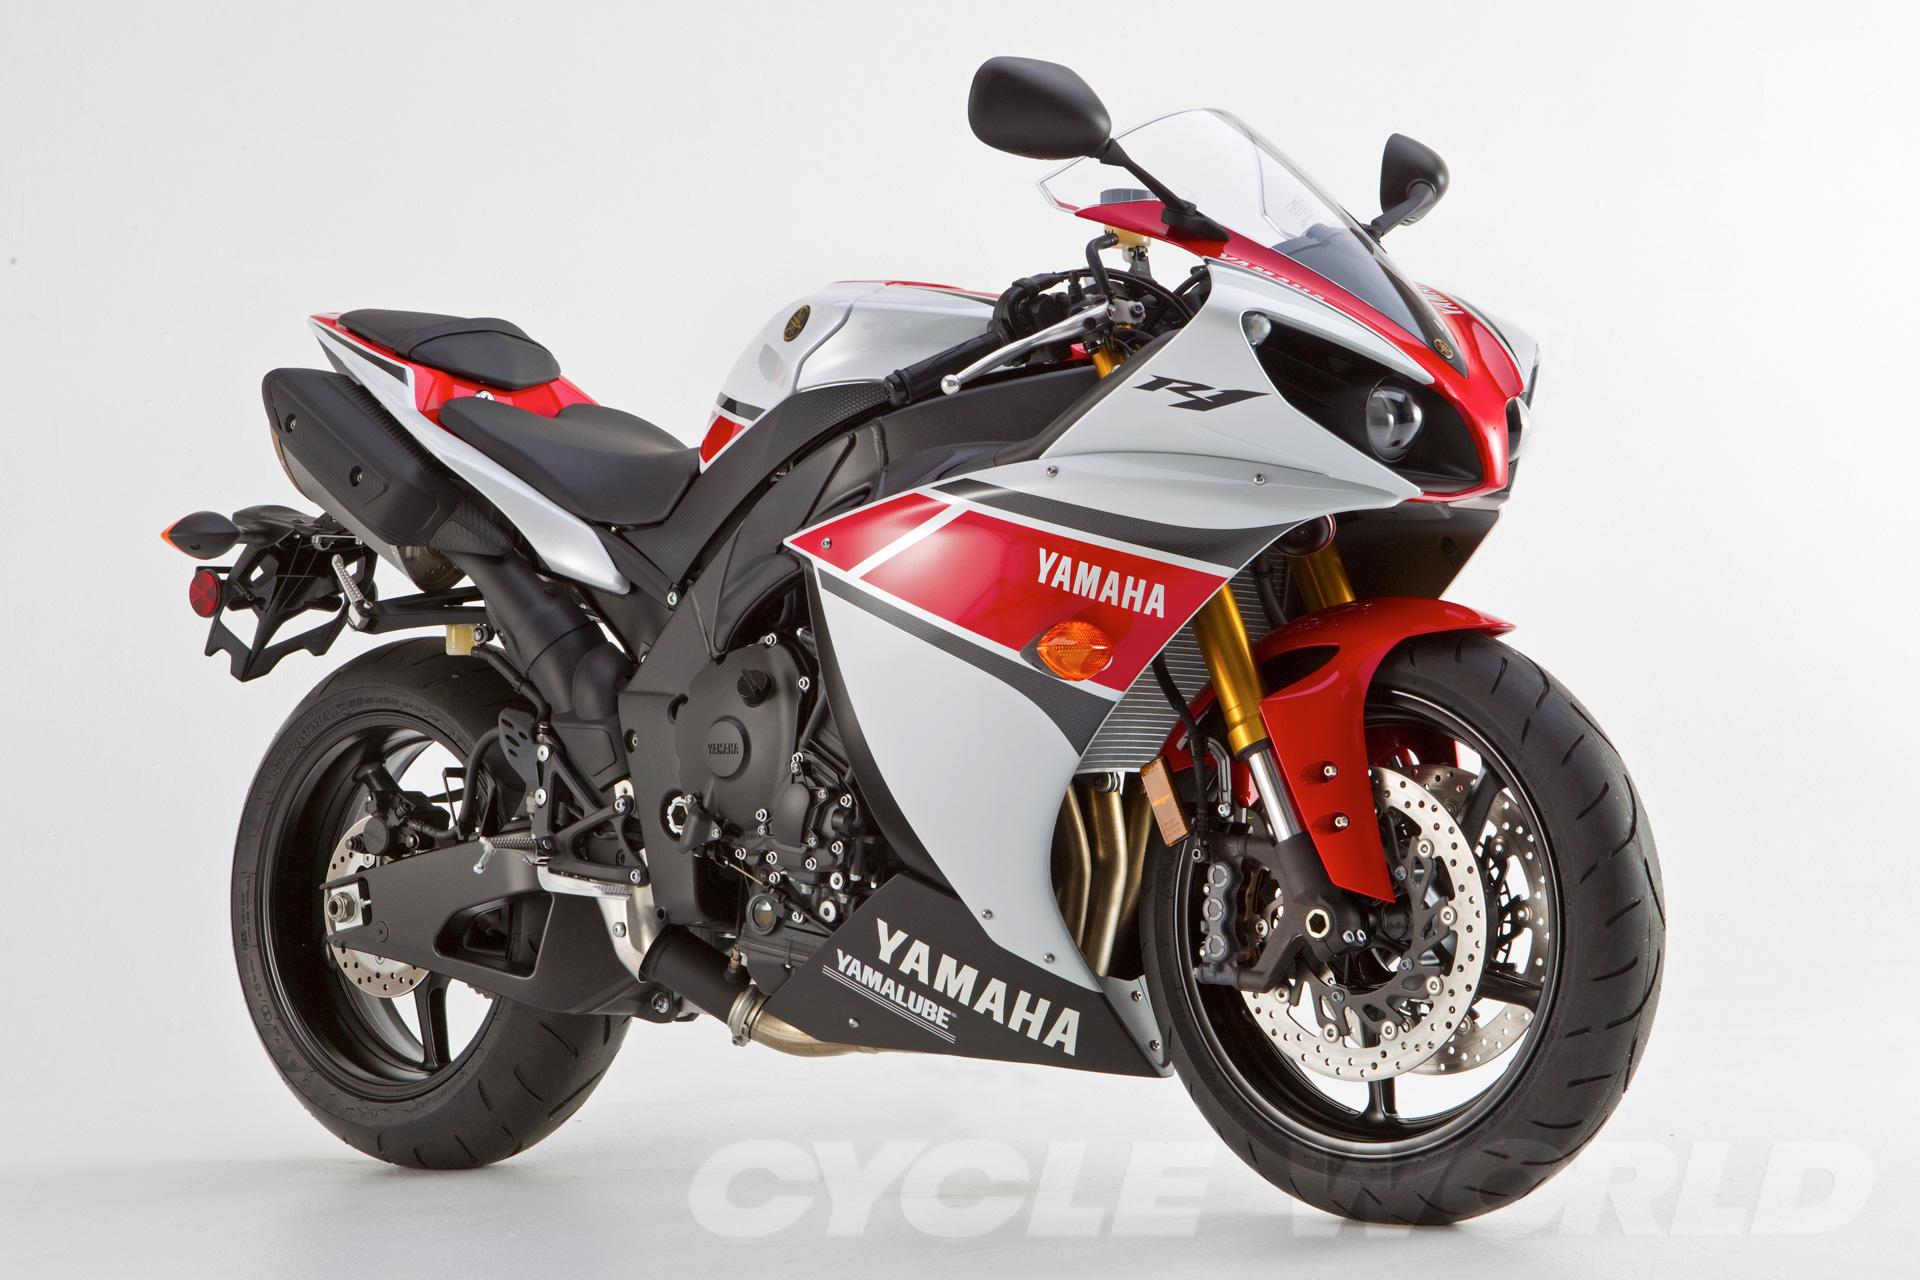 http://com.cycleworld.s3.amazonaws.com/wp-content/uploads/2011/09/2012-yamaha-yzf-r1_001.jpg